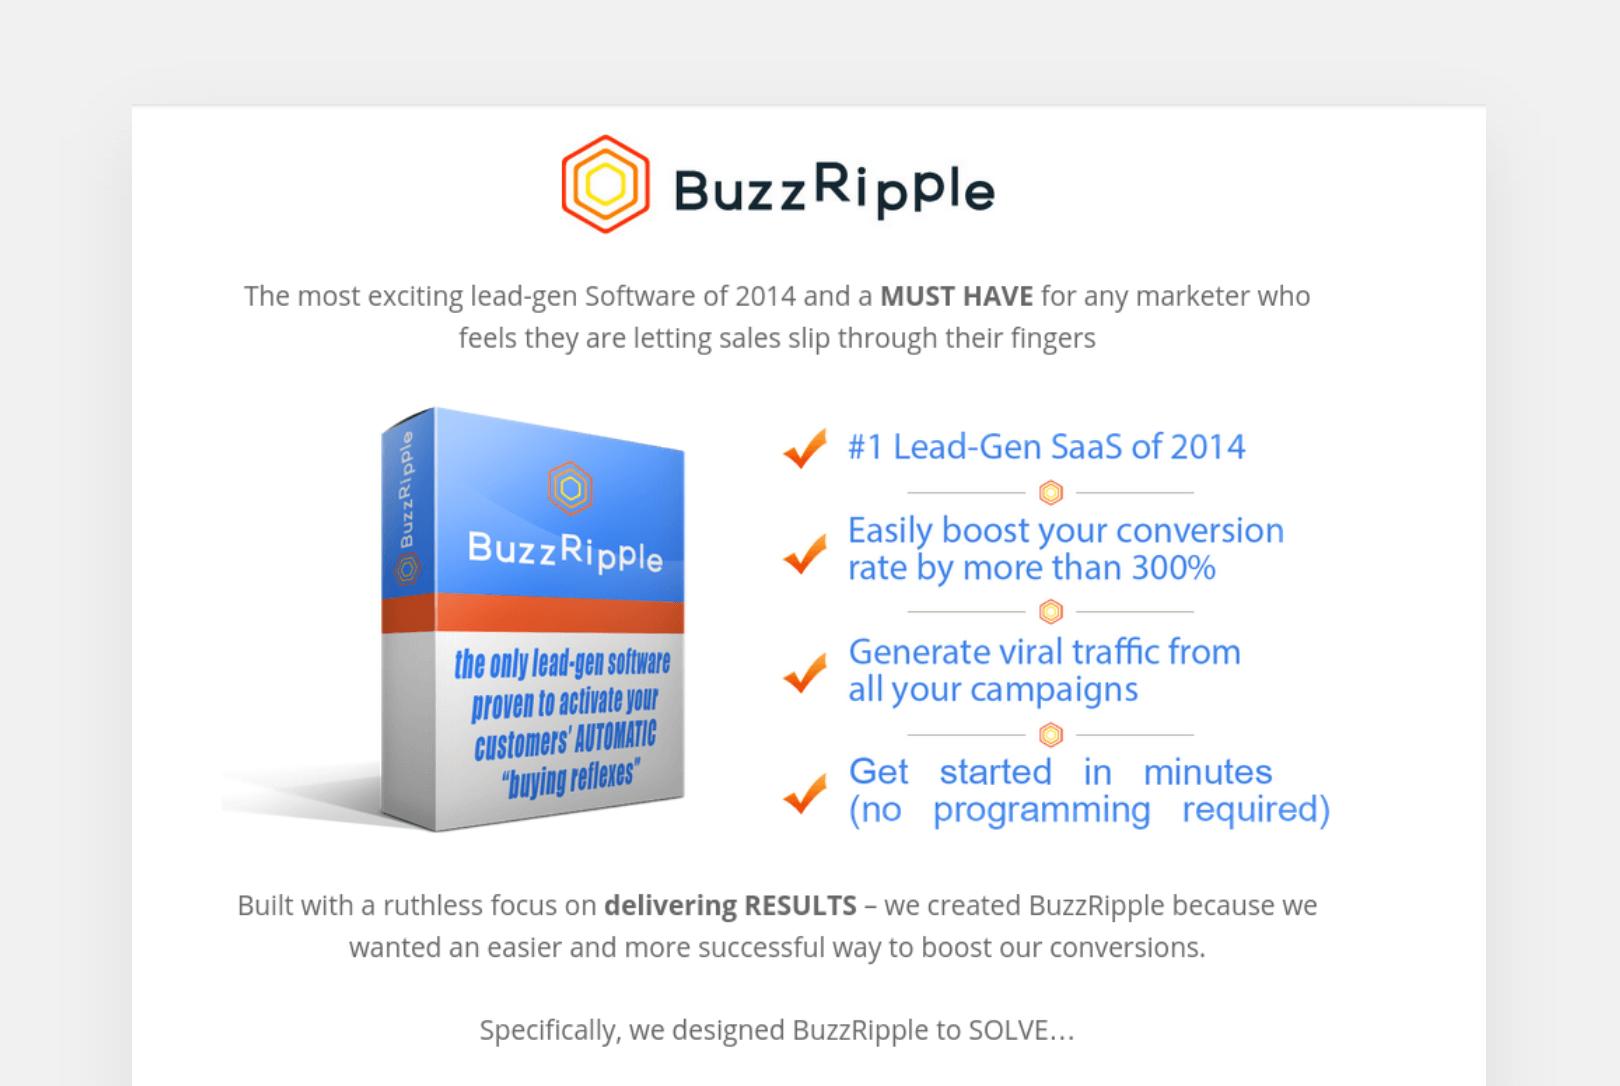 BuzzRipple lead-gen software page screenshot